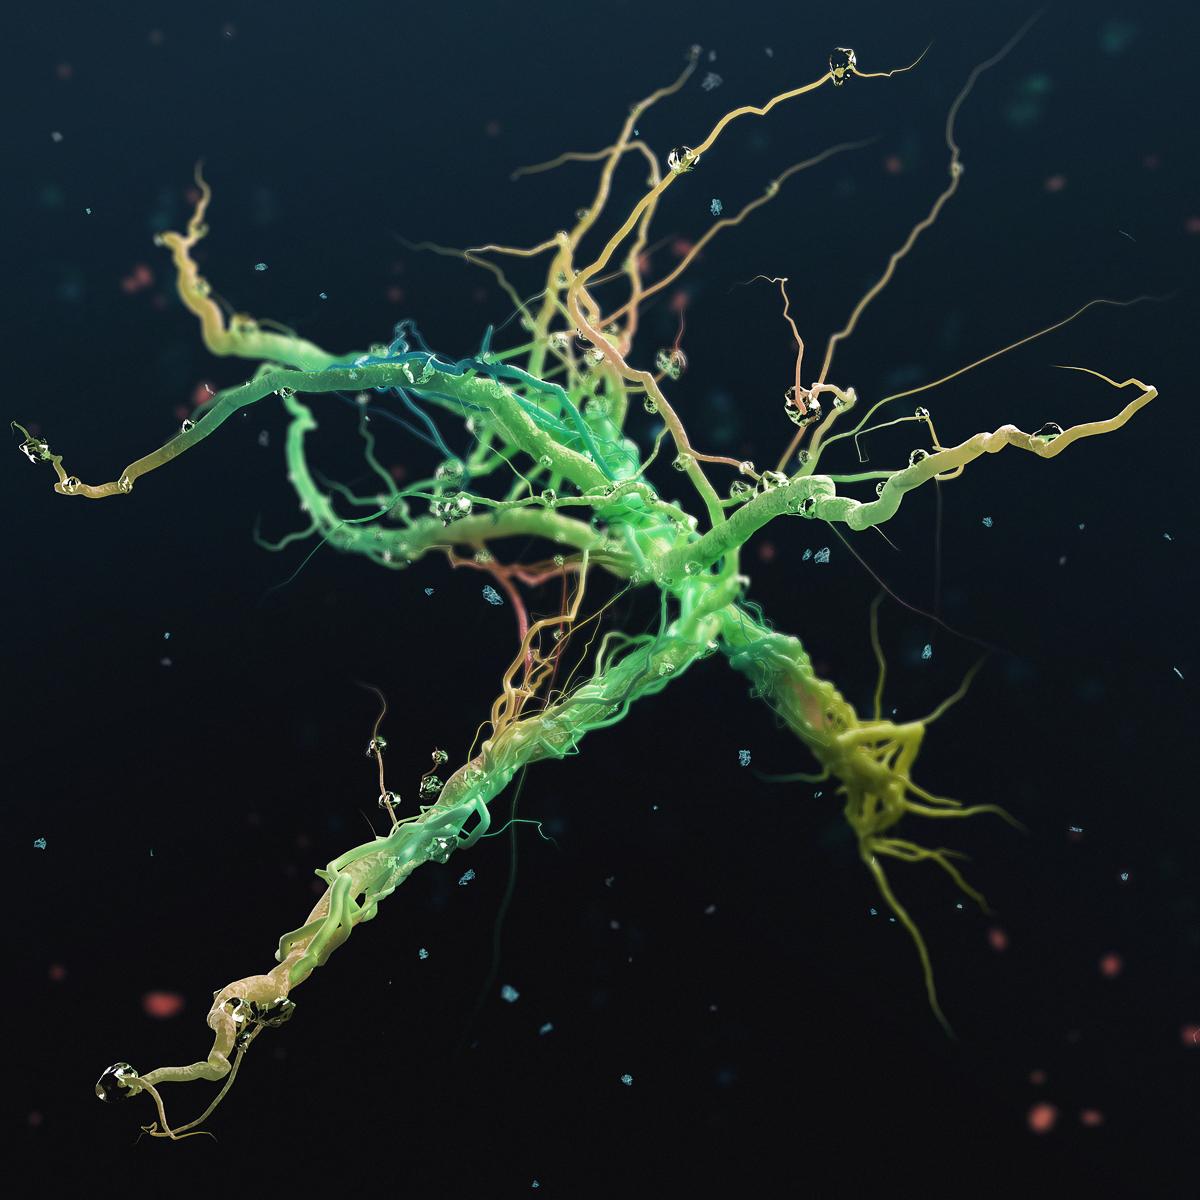 Rhizome - Bioshap3d 3D project